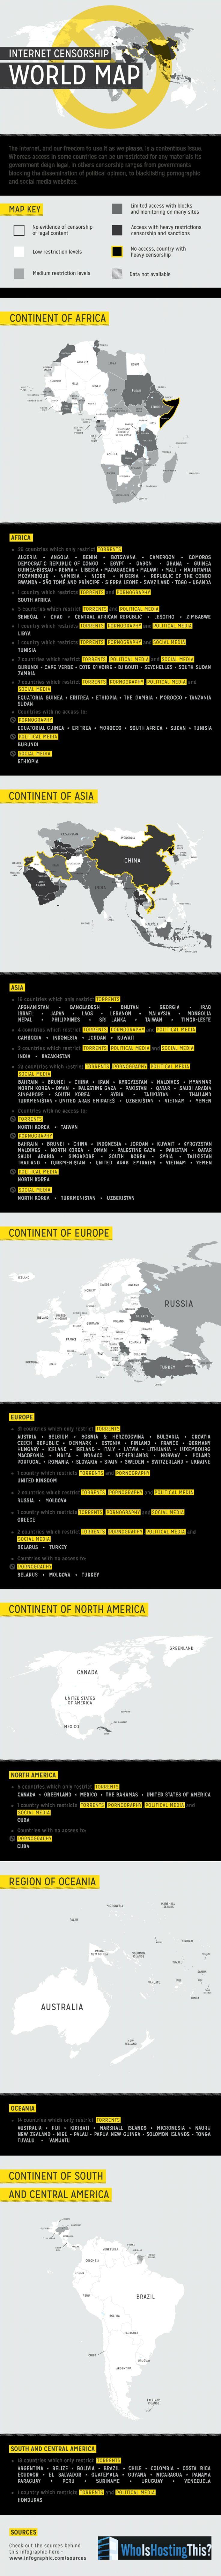 Internet Censorship World Map